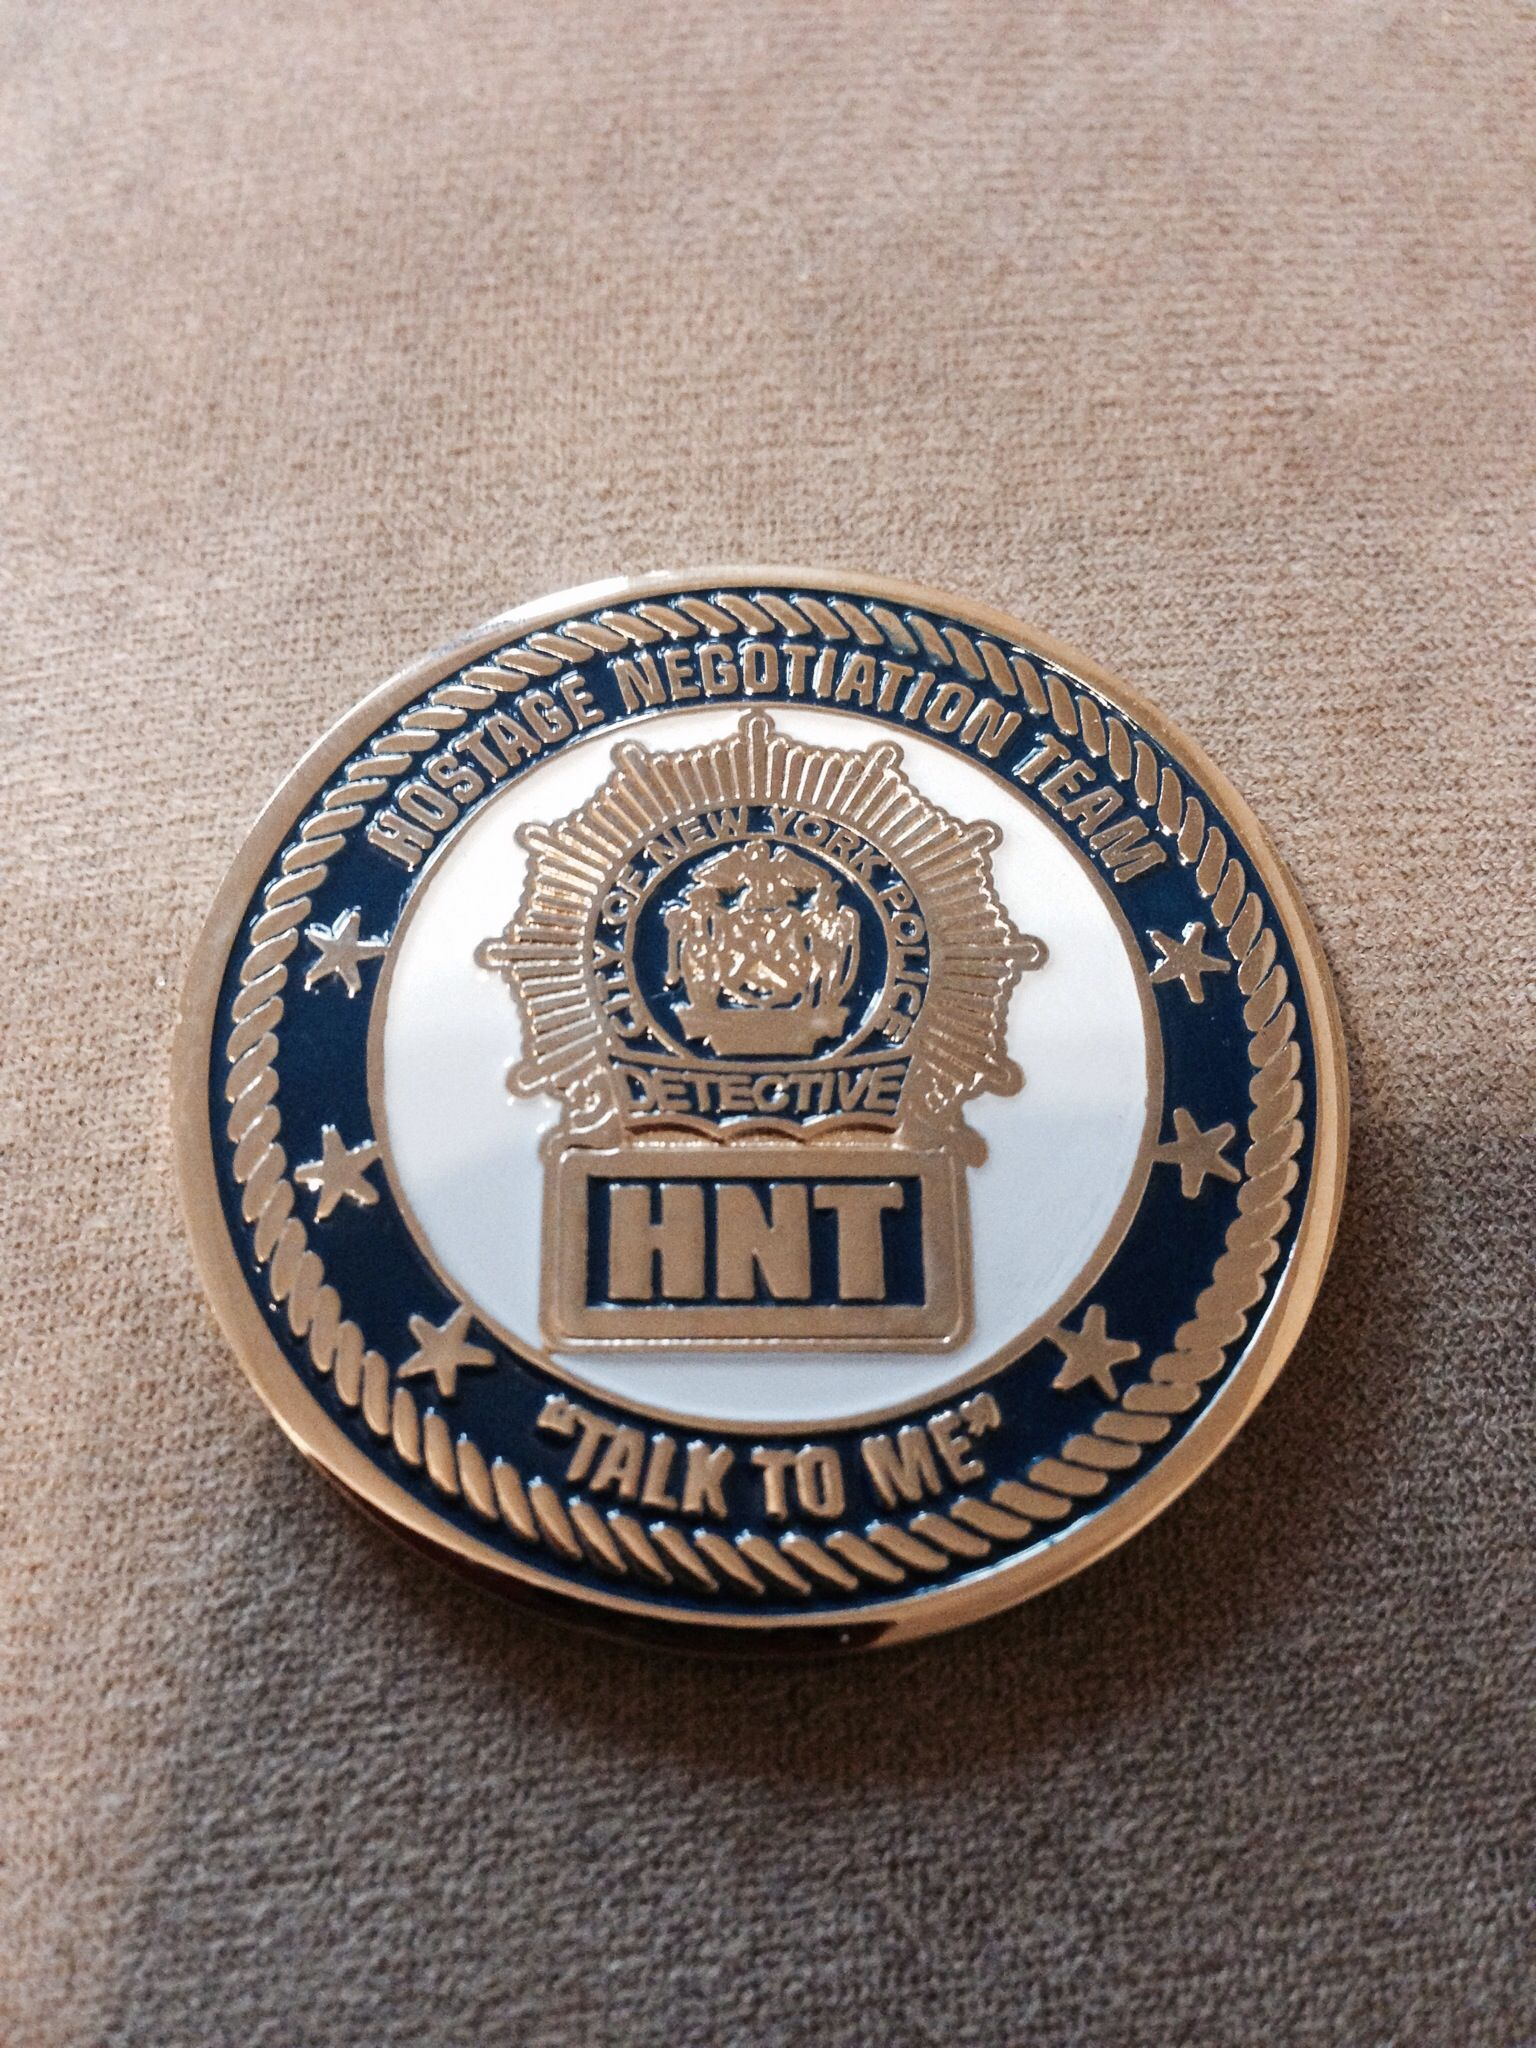 new york police department detective bureau hostage negotiator team nypd pinterest police. Black Bedroom Furniture Sets. Home Design Ideas